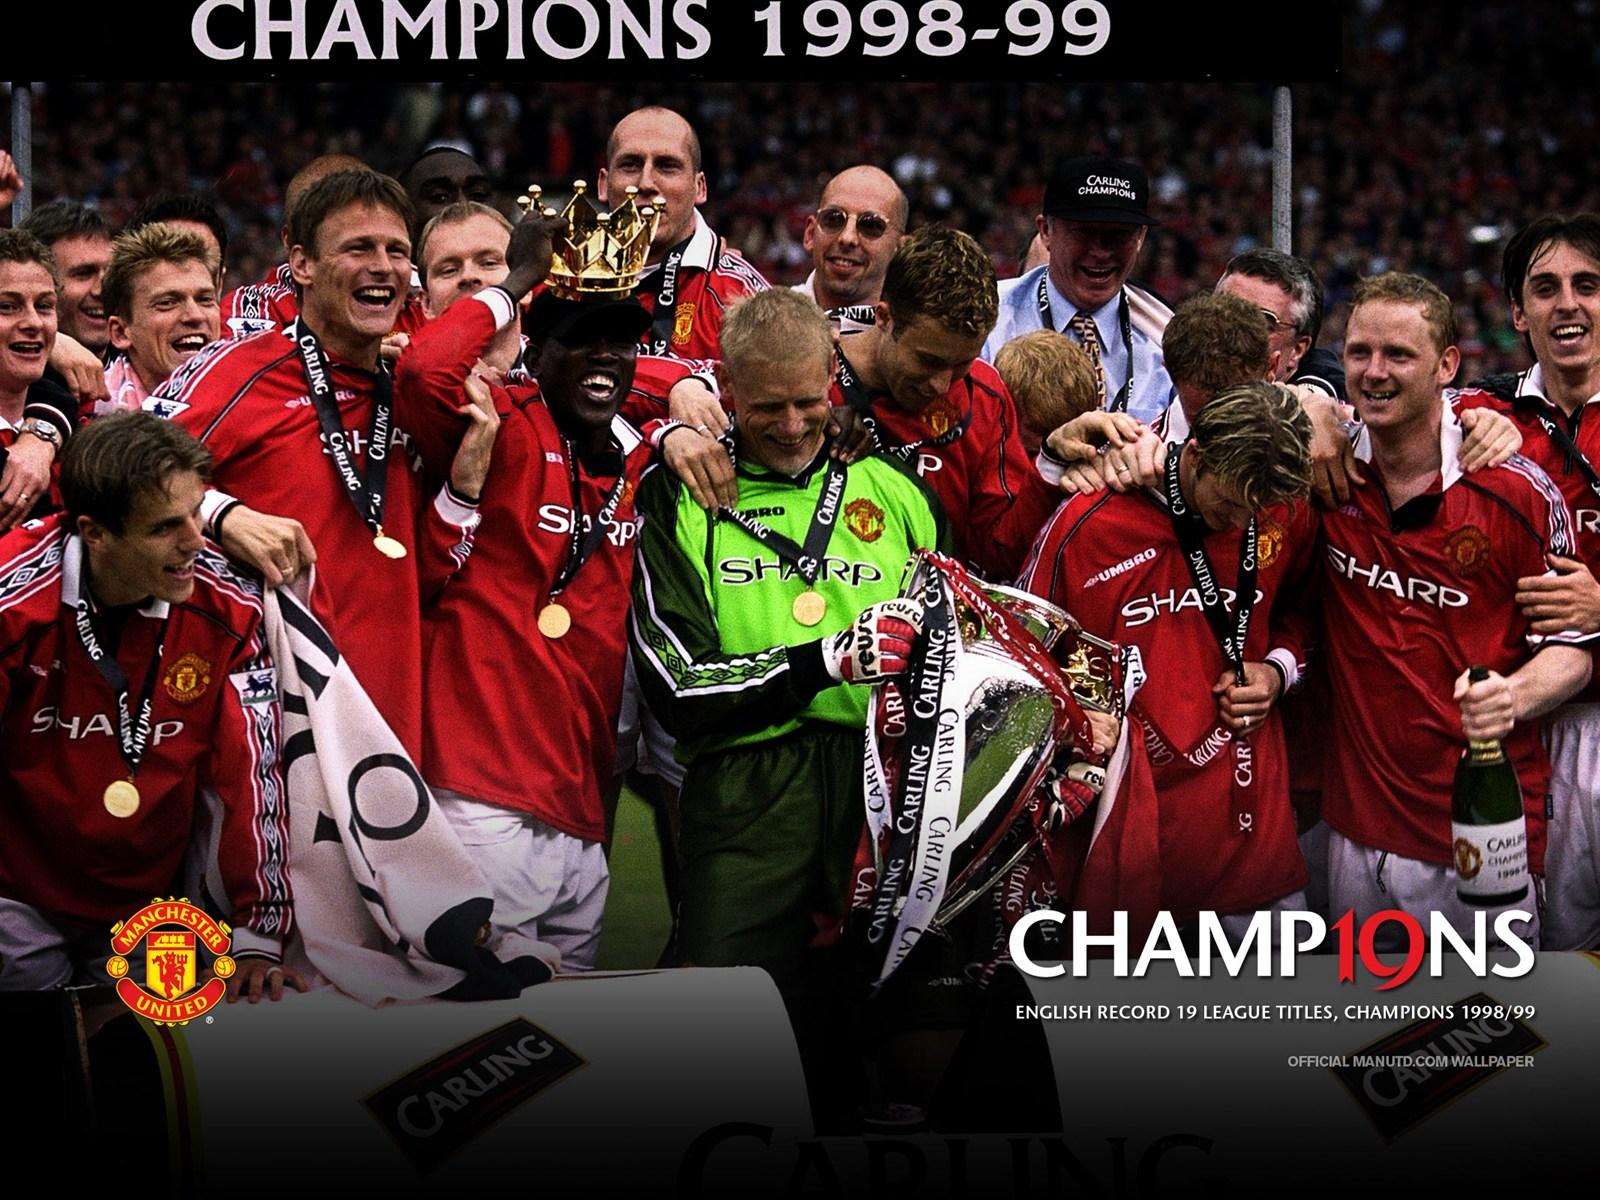 Champions1998 1999jpg